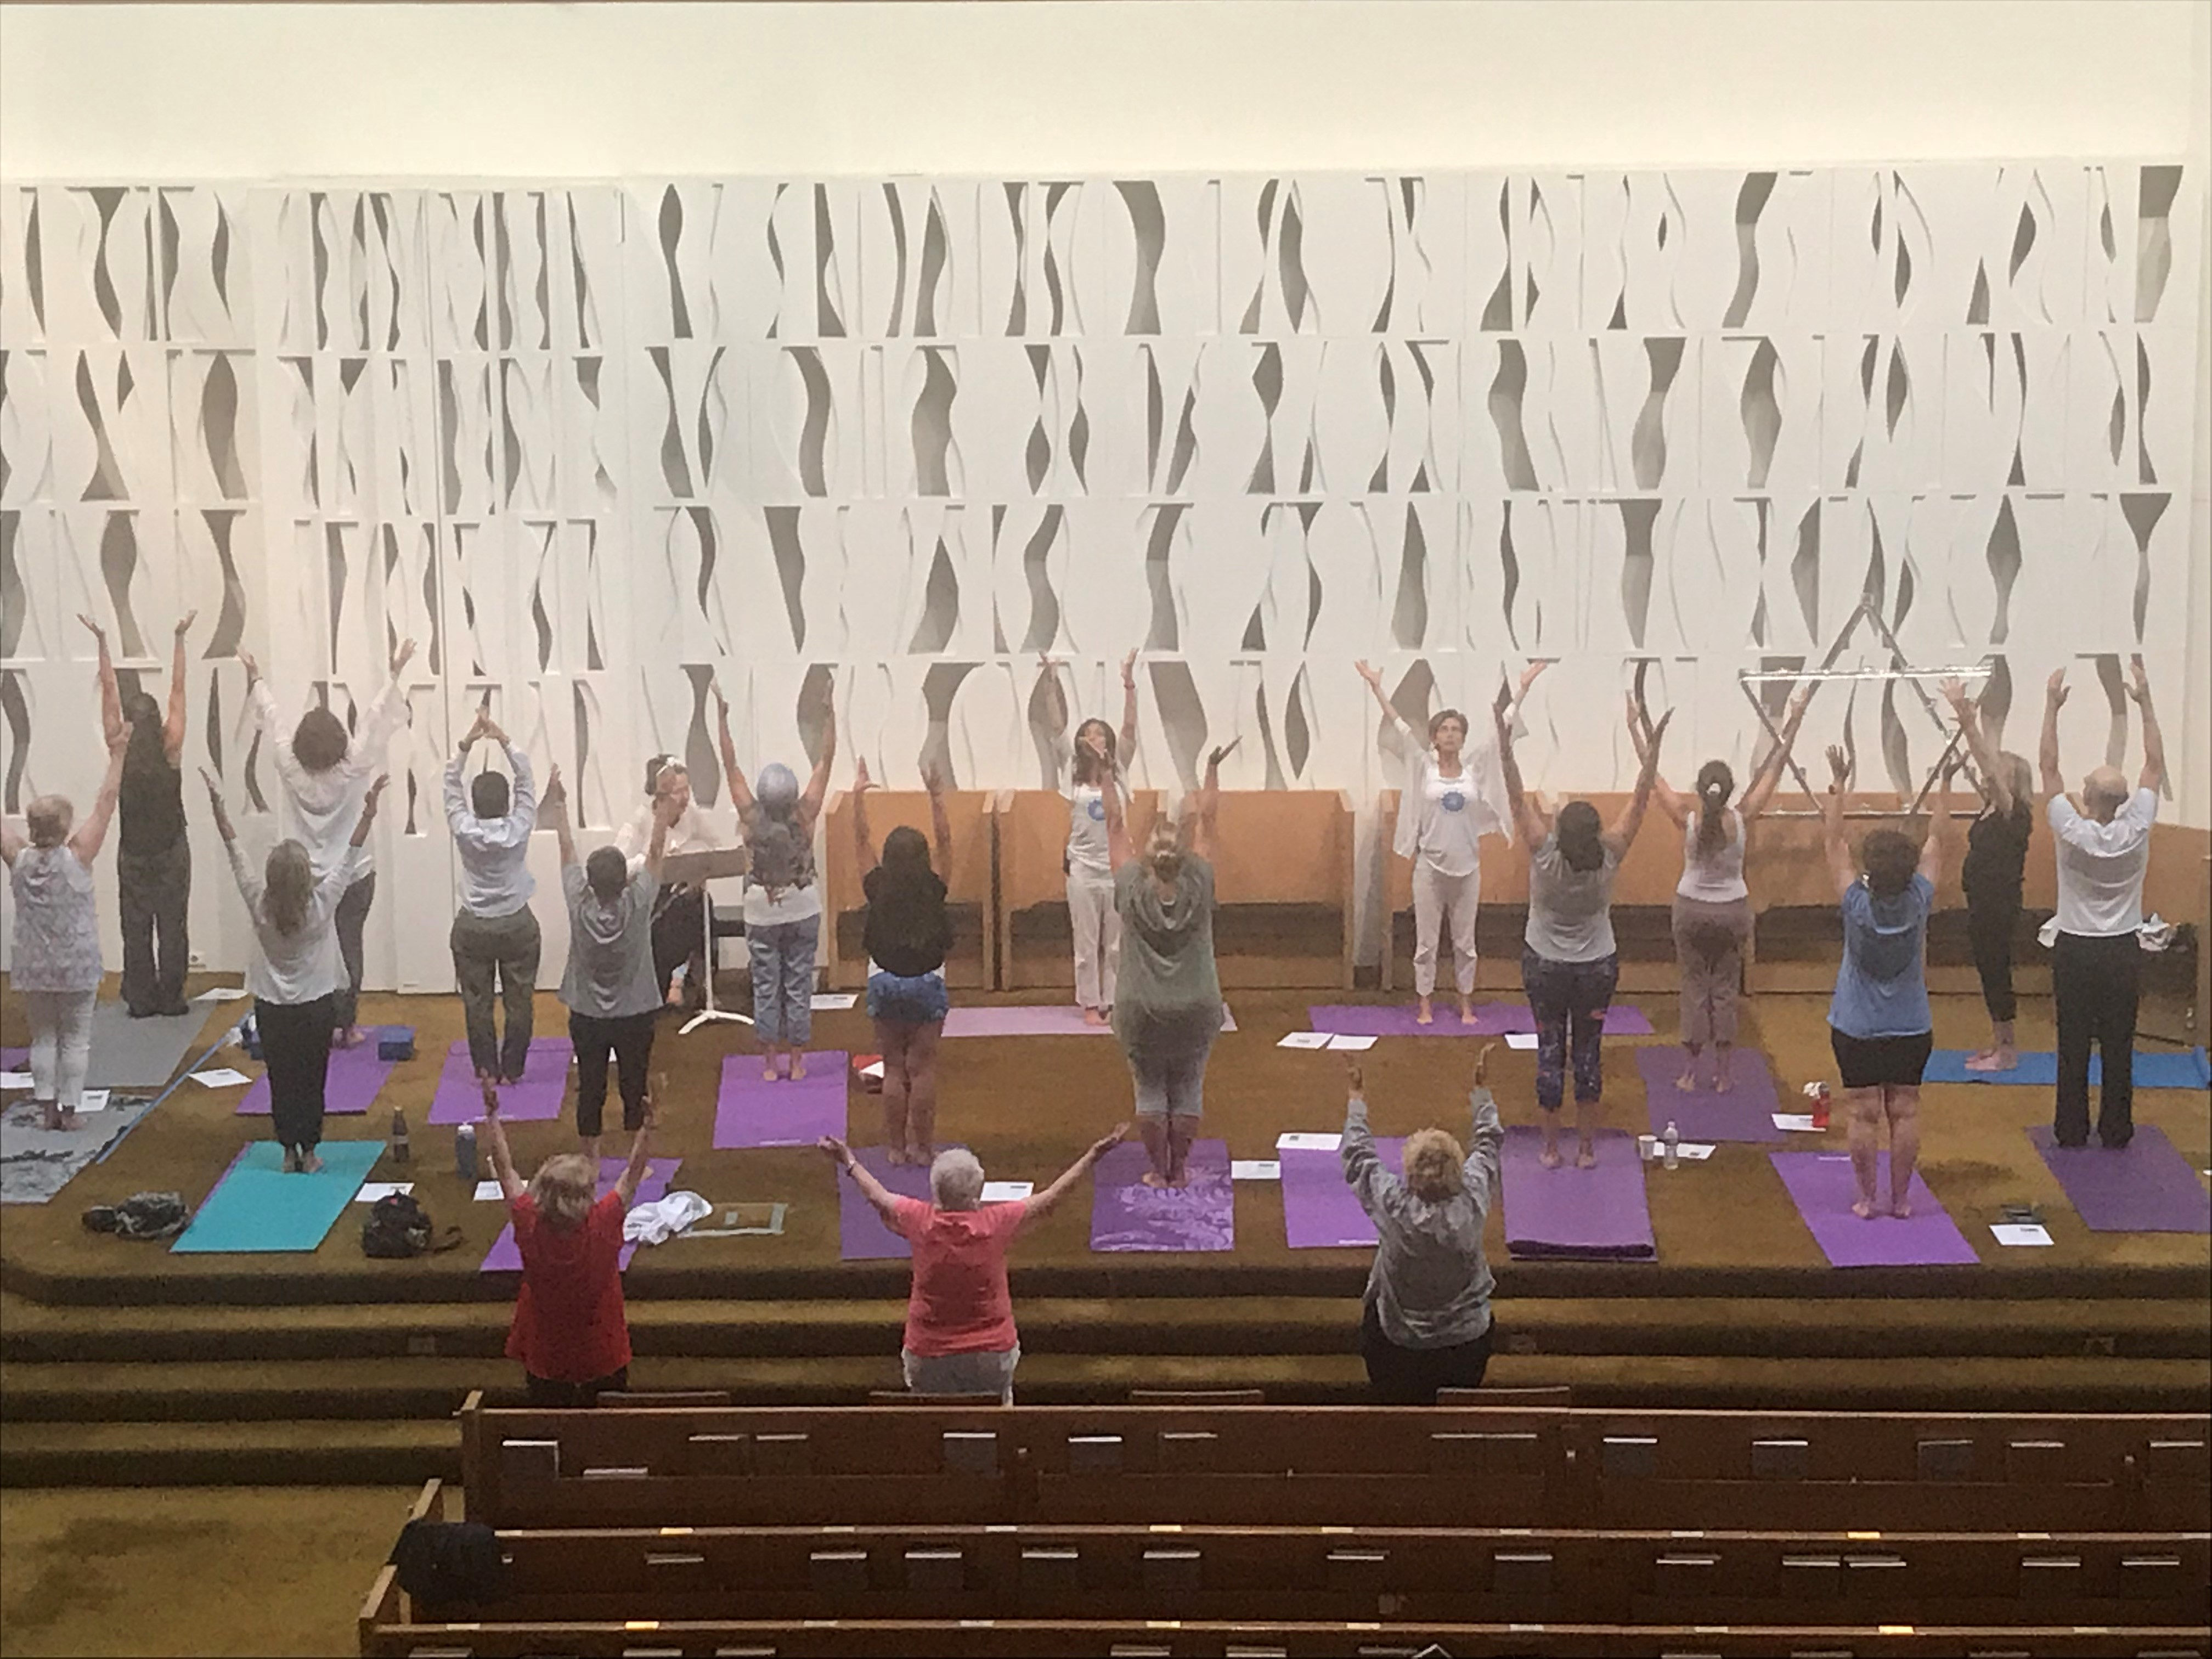 Long Island To Celebrate Shabbat With Yoga Blog The Island Now